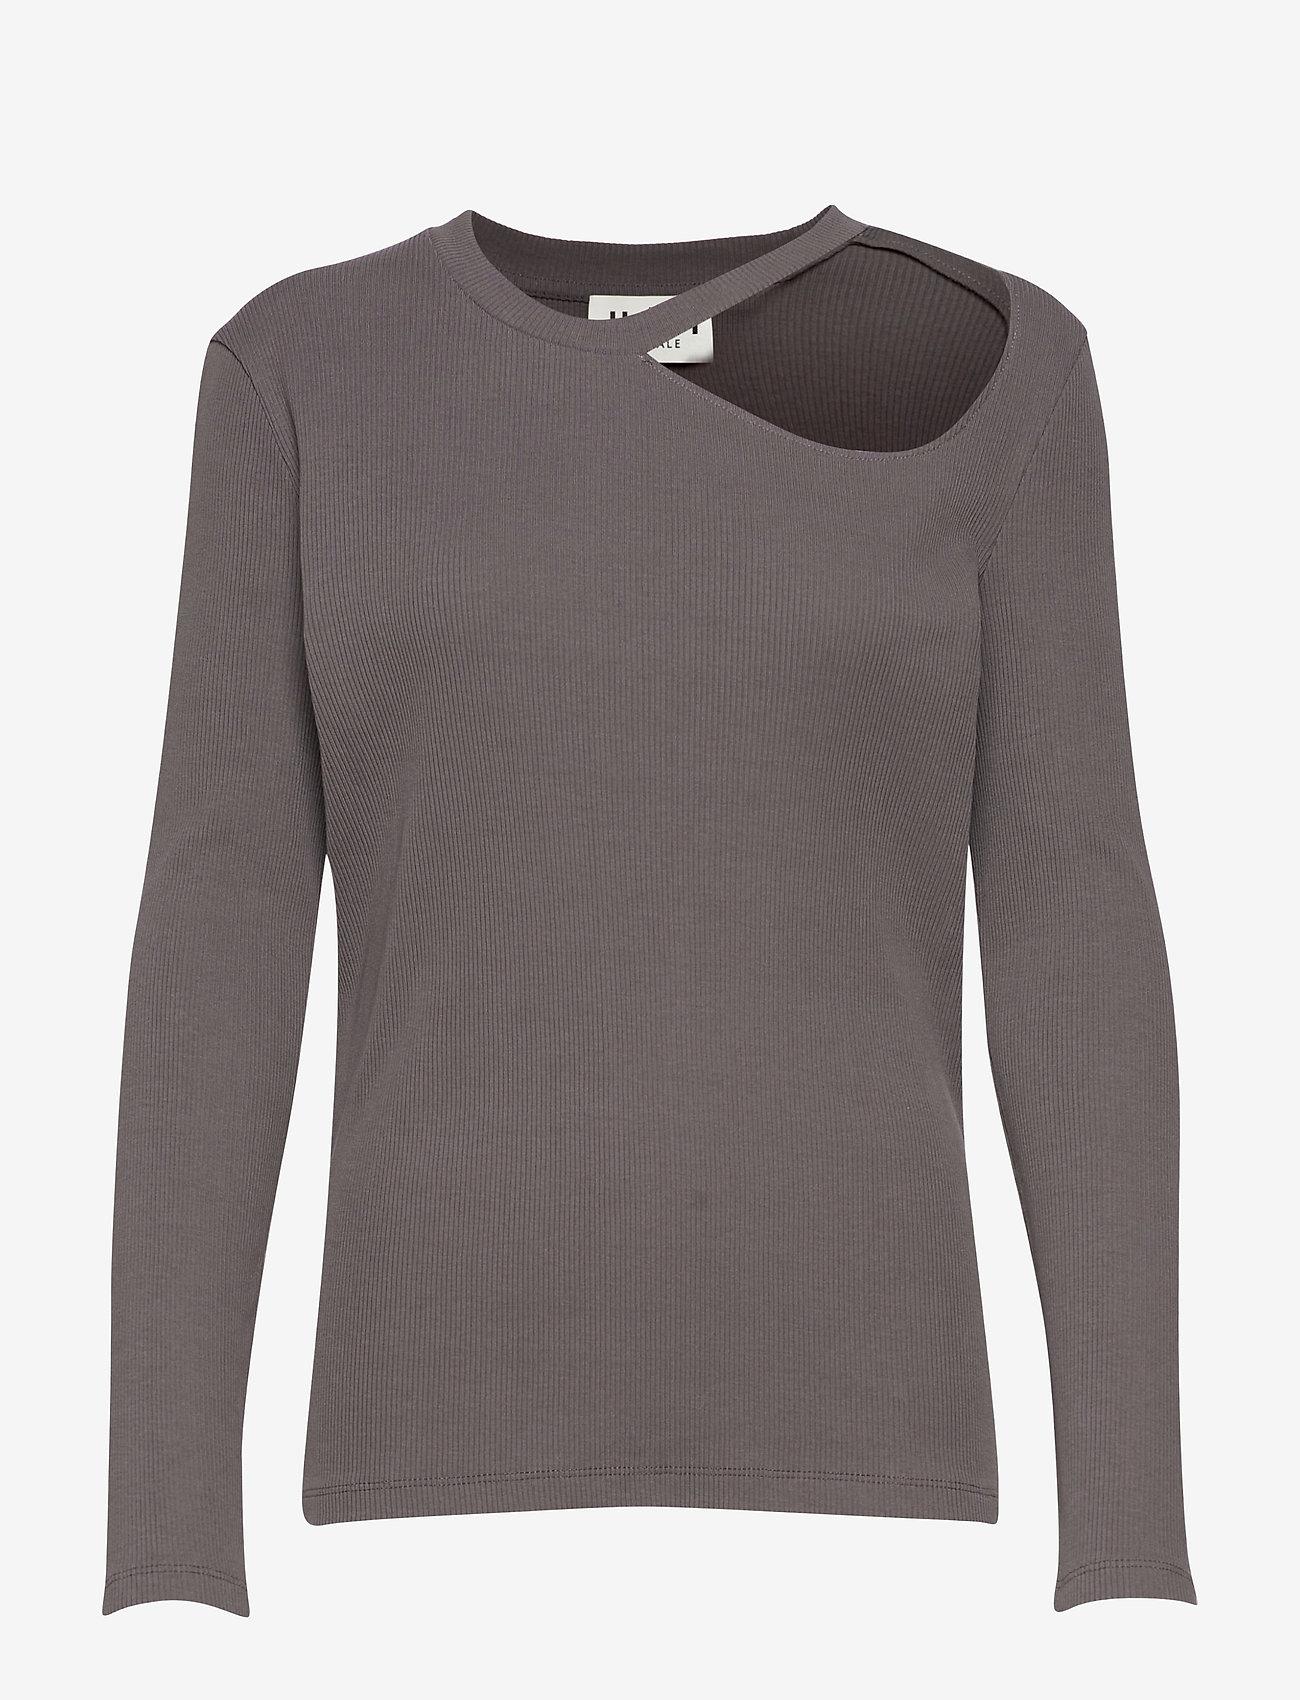 Just Female - Rancho ls tee - t-shirt & tops - pavement - 1